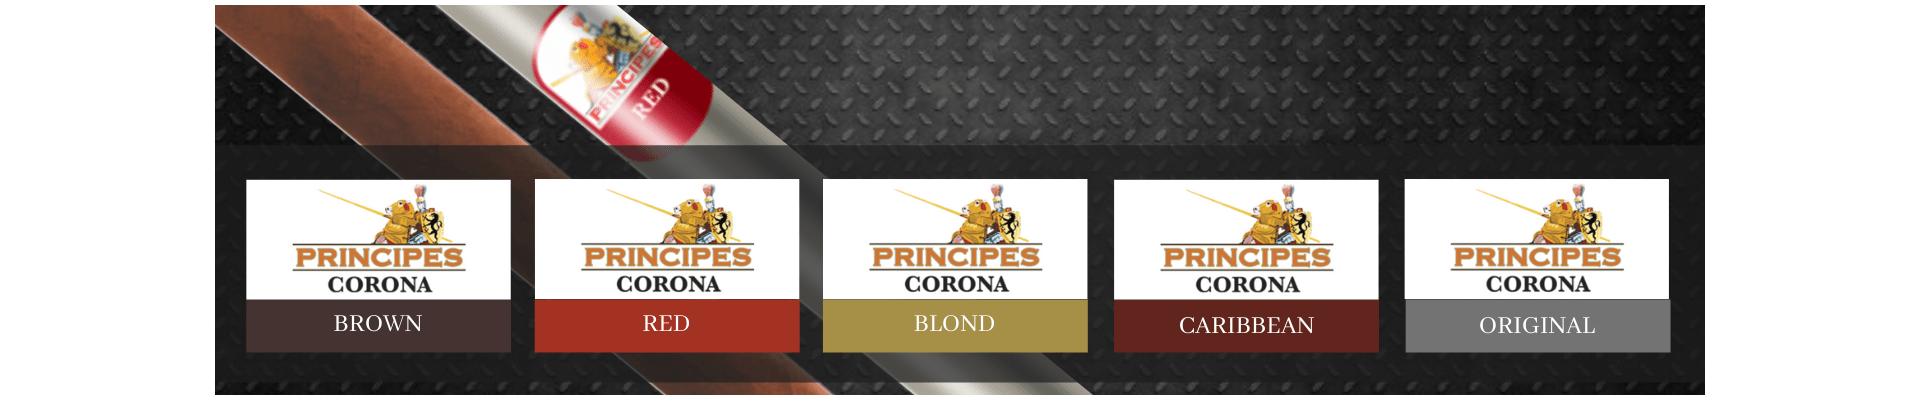 Tigari de foi La Aurora Principes.Magazin tigari de foi La Aurora Principes Corona